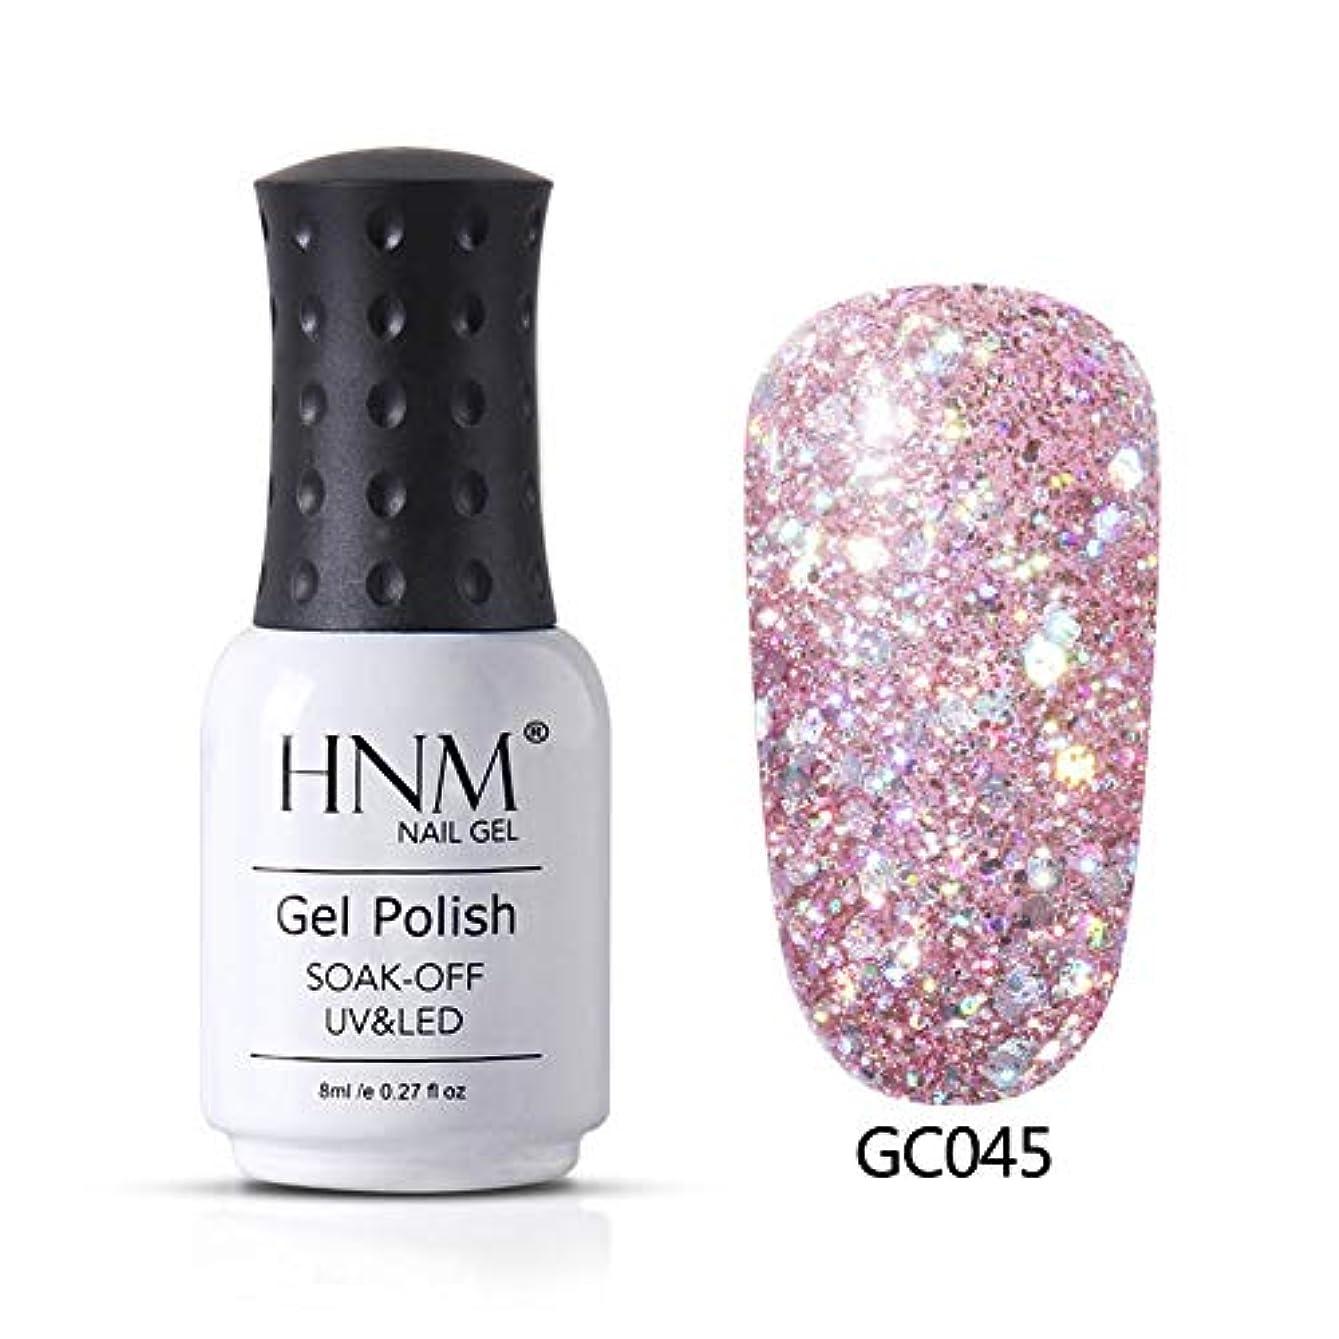 HNM ジェルネイル カラージェル ダイヤモンド系 グリッタージェル 8ml【全96色選択可】